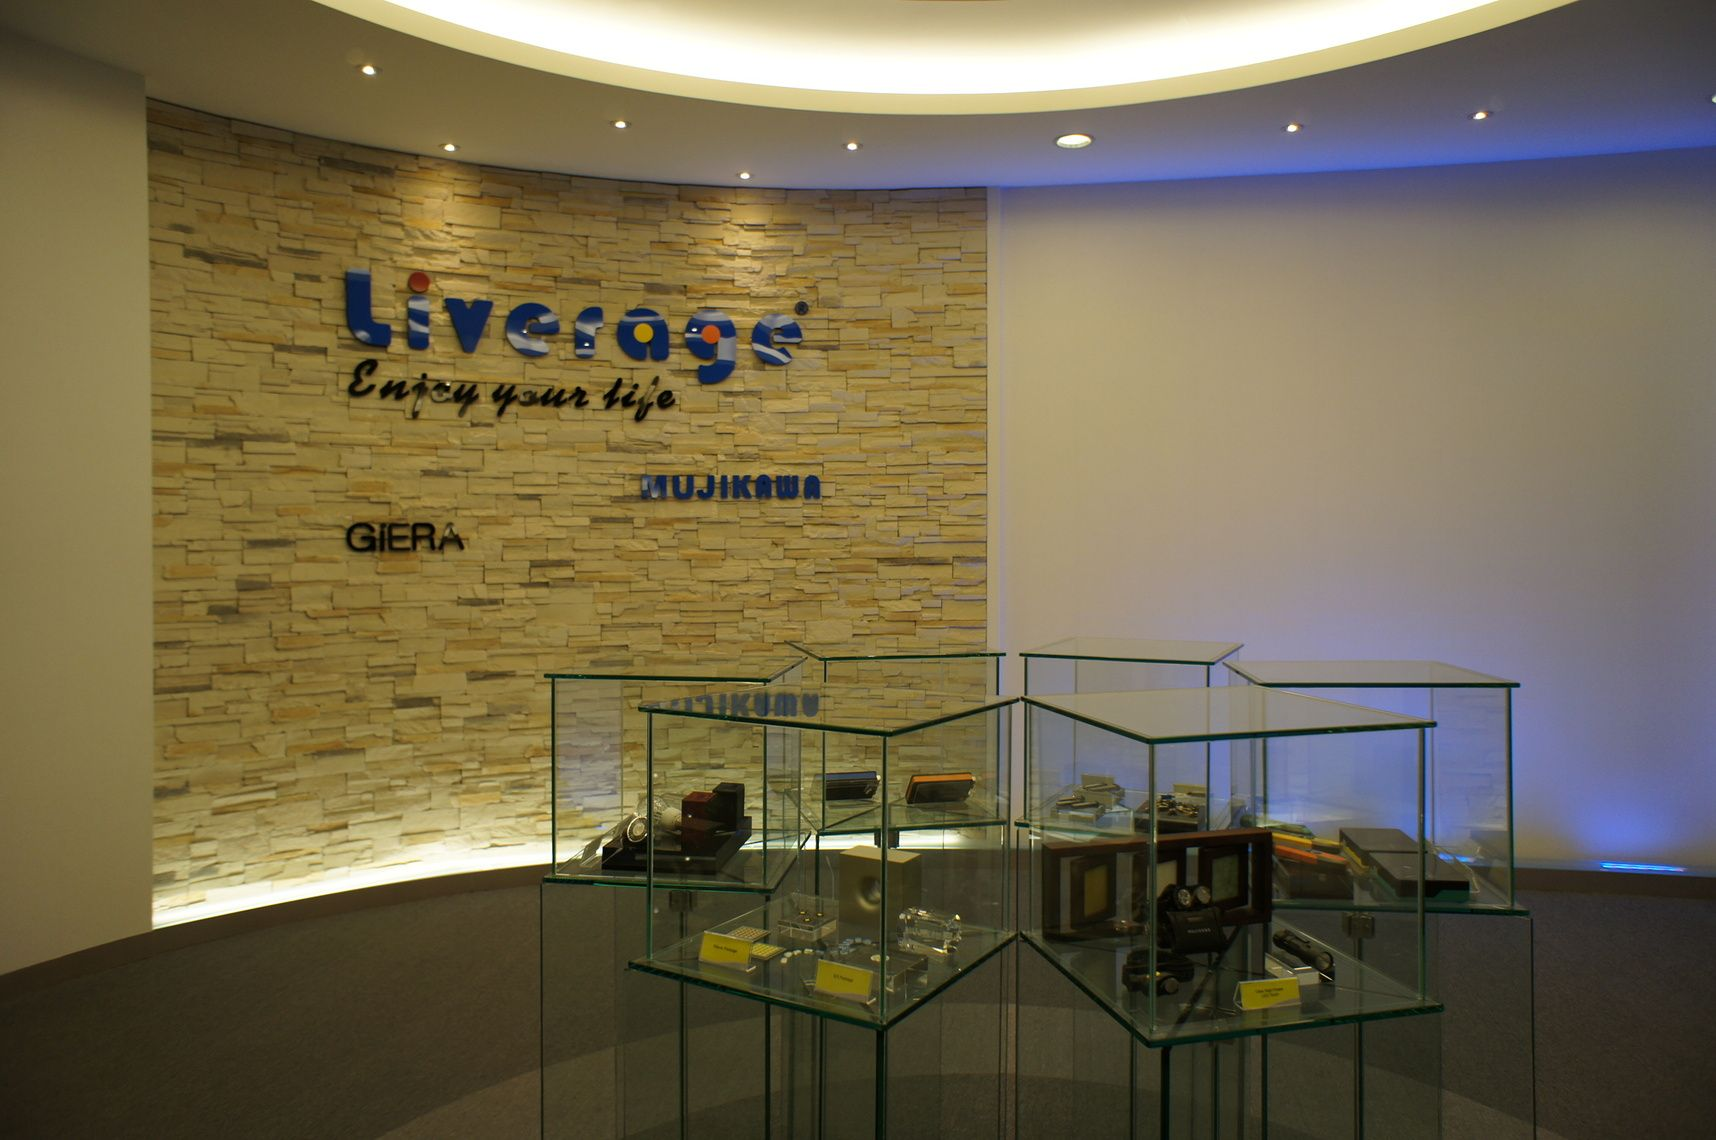 Liverage 15年以上にわたって光ファイバー通信業界に専念してきました。